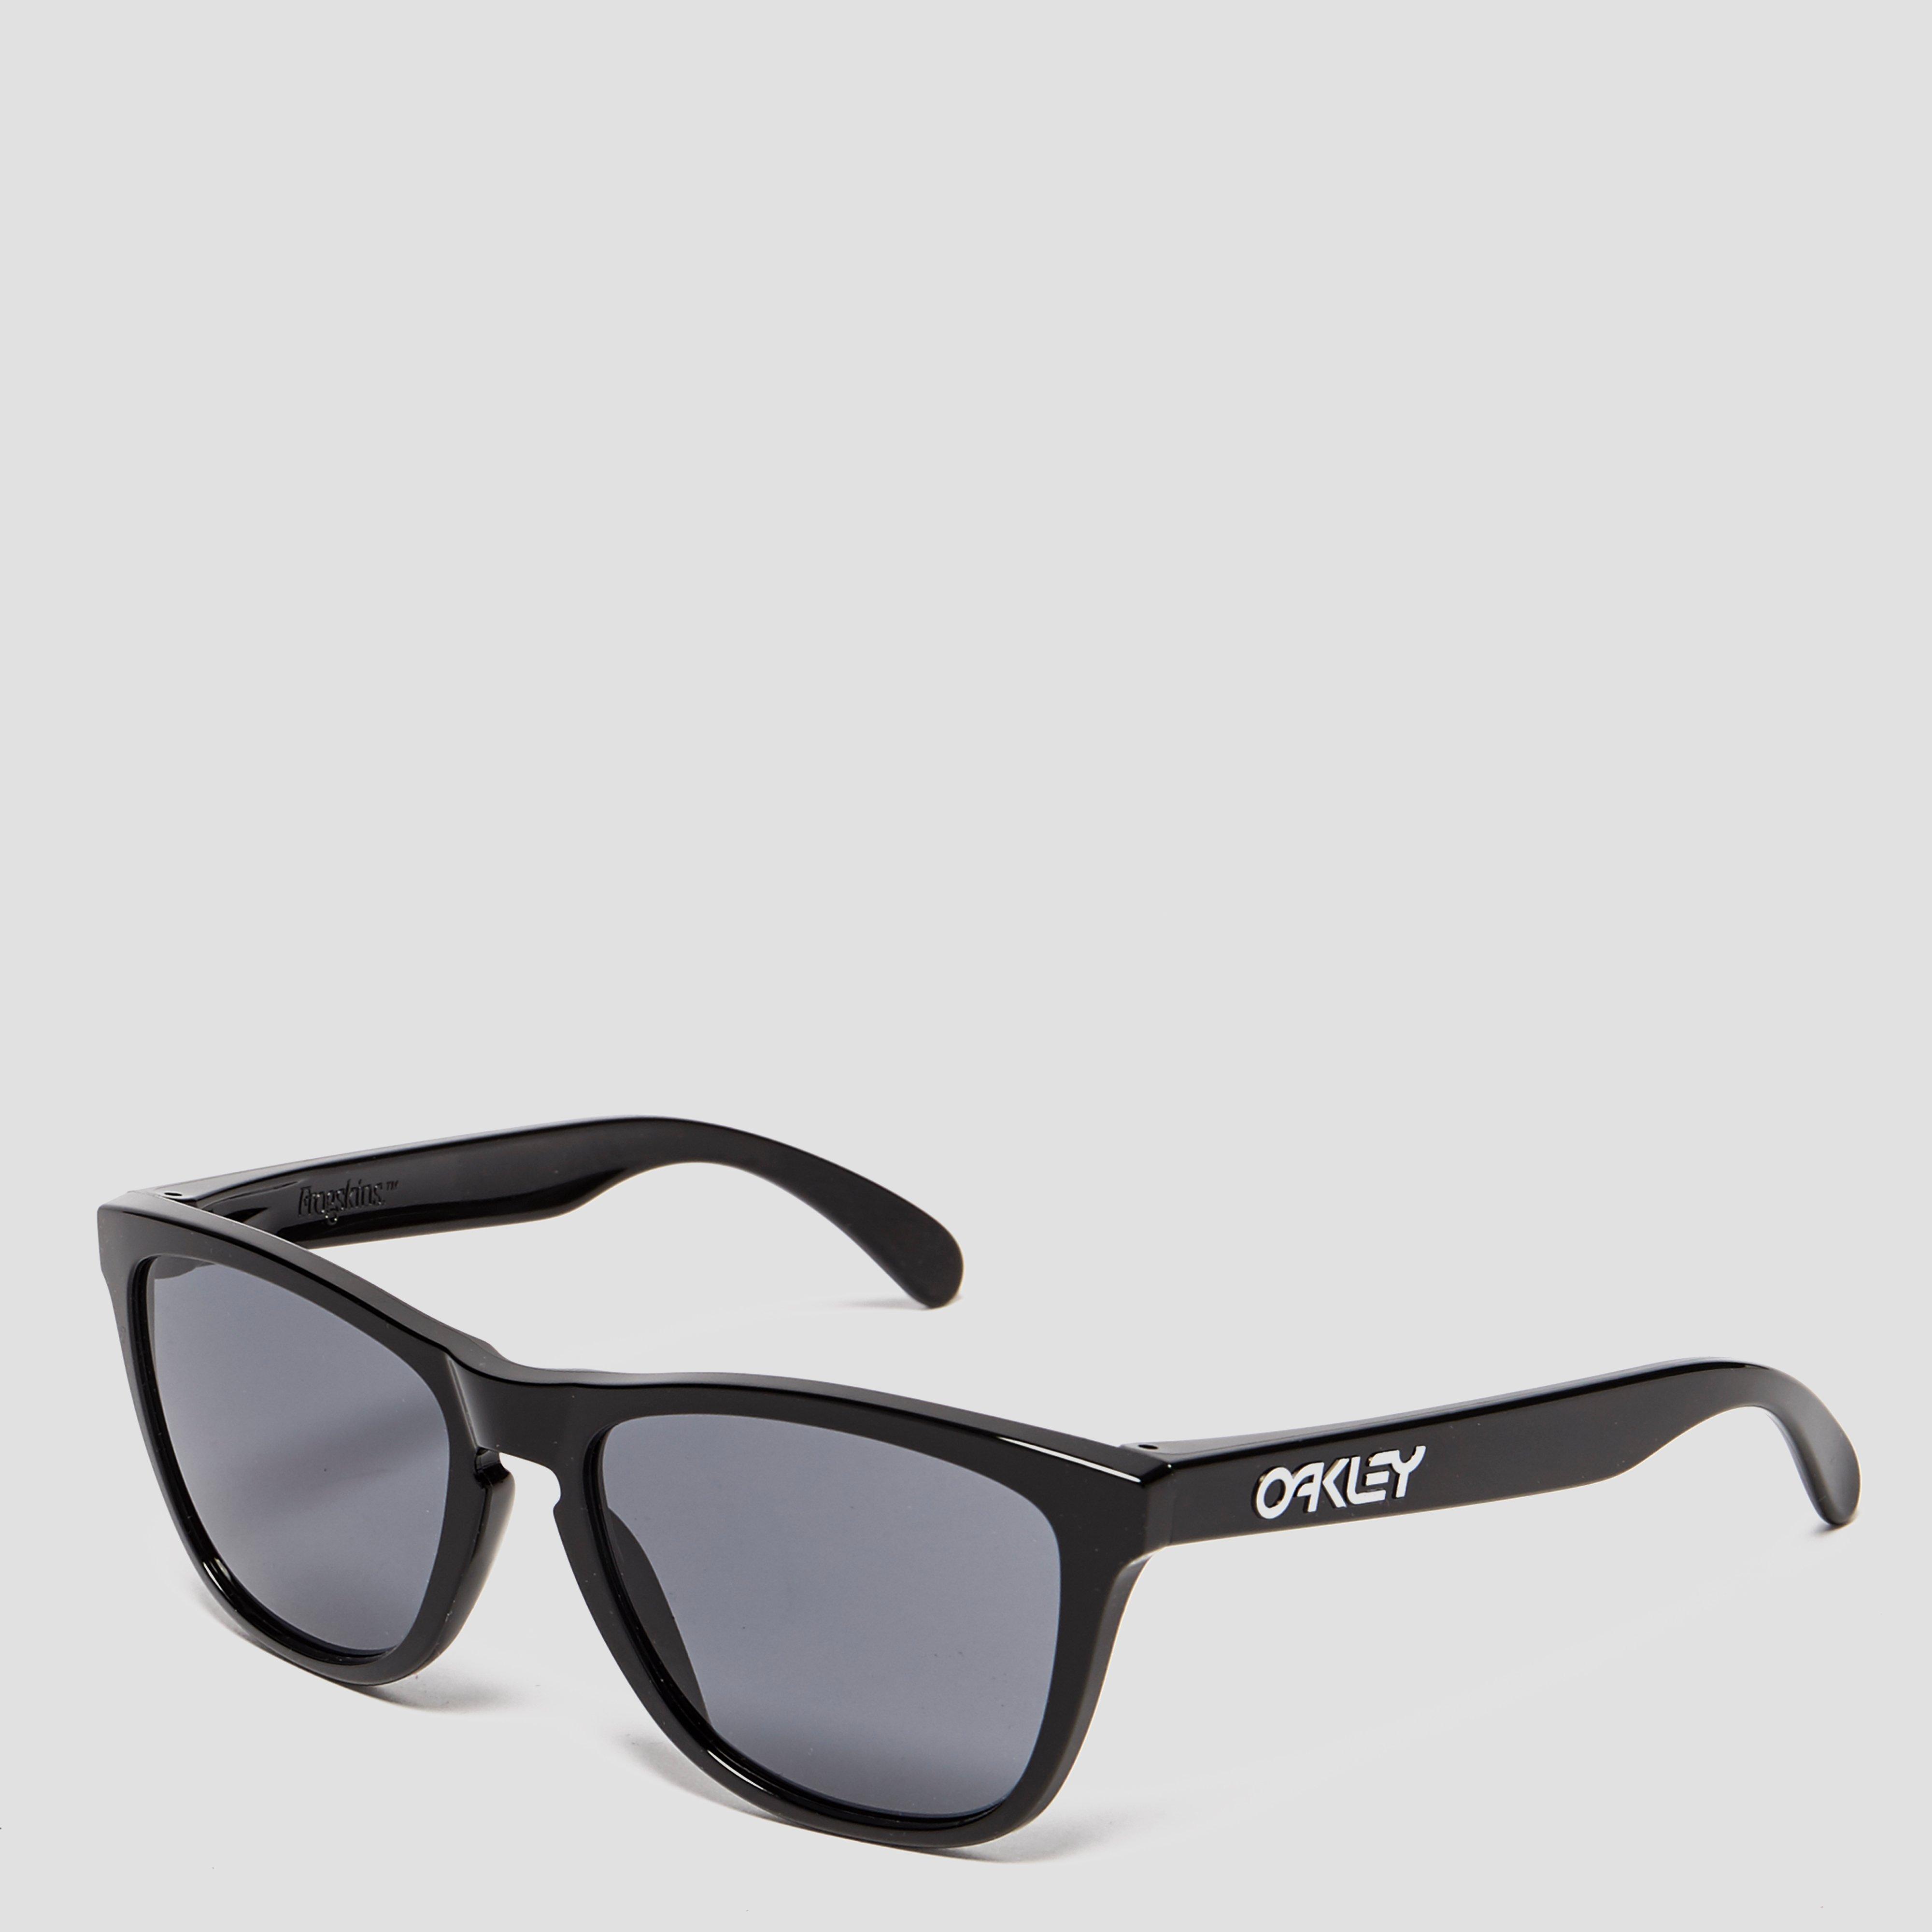 Oakley Frogskins Sunglasses, Assorted